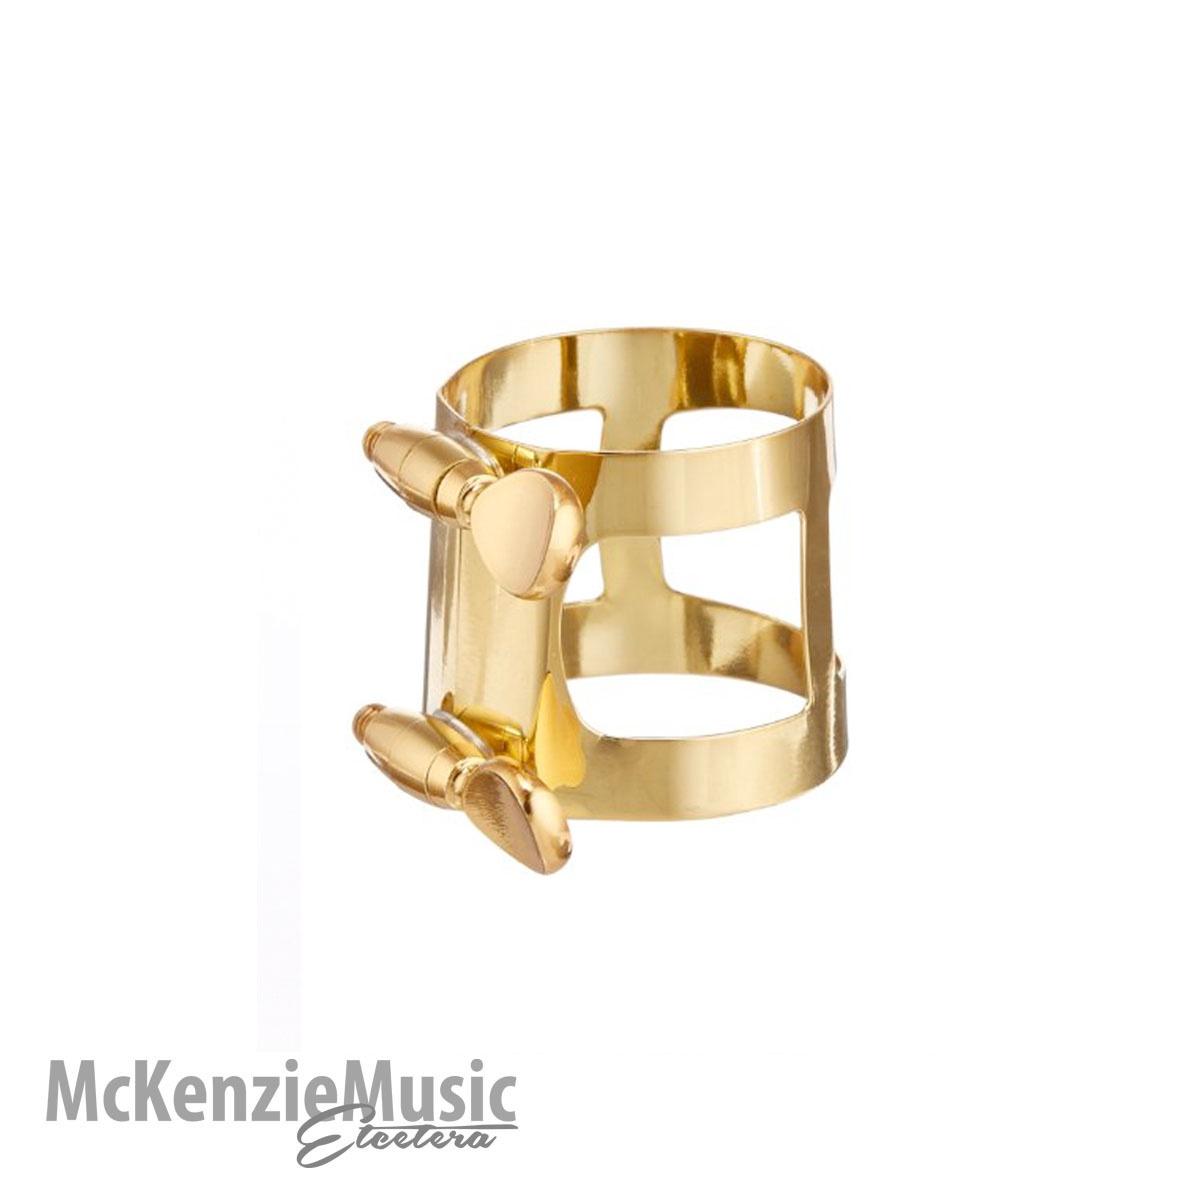 Baritone Saxophone Ligature Metal